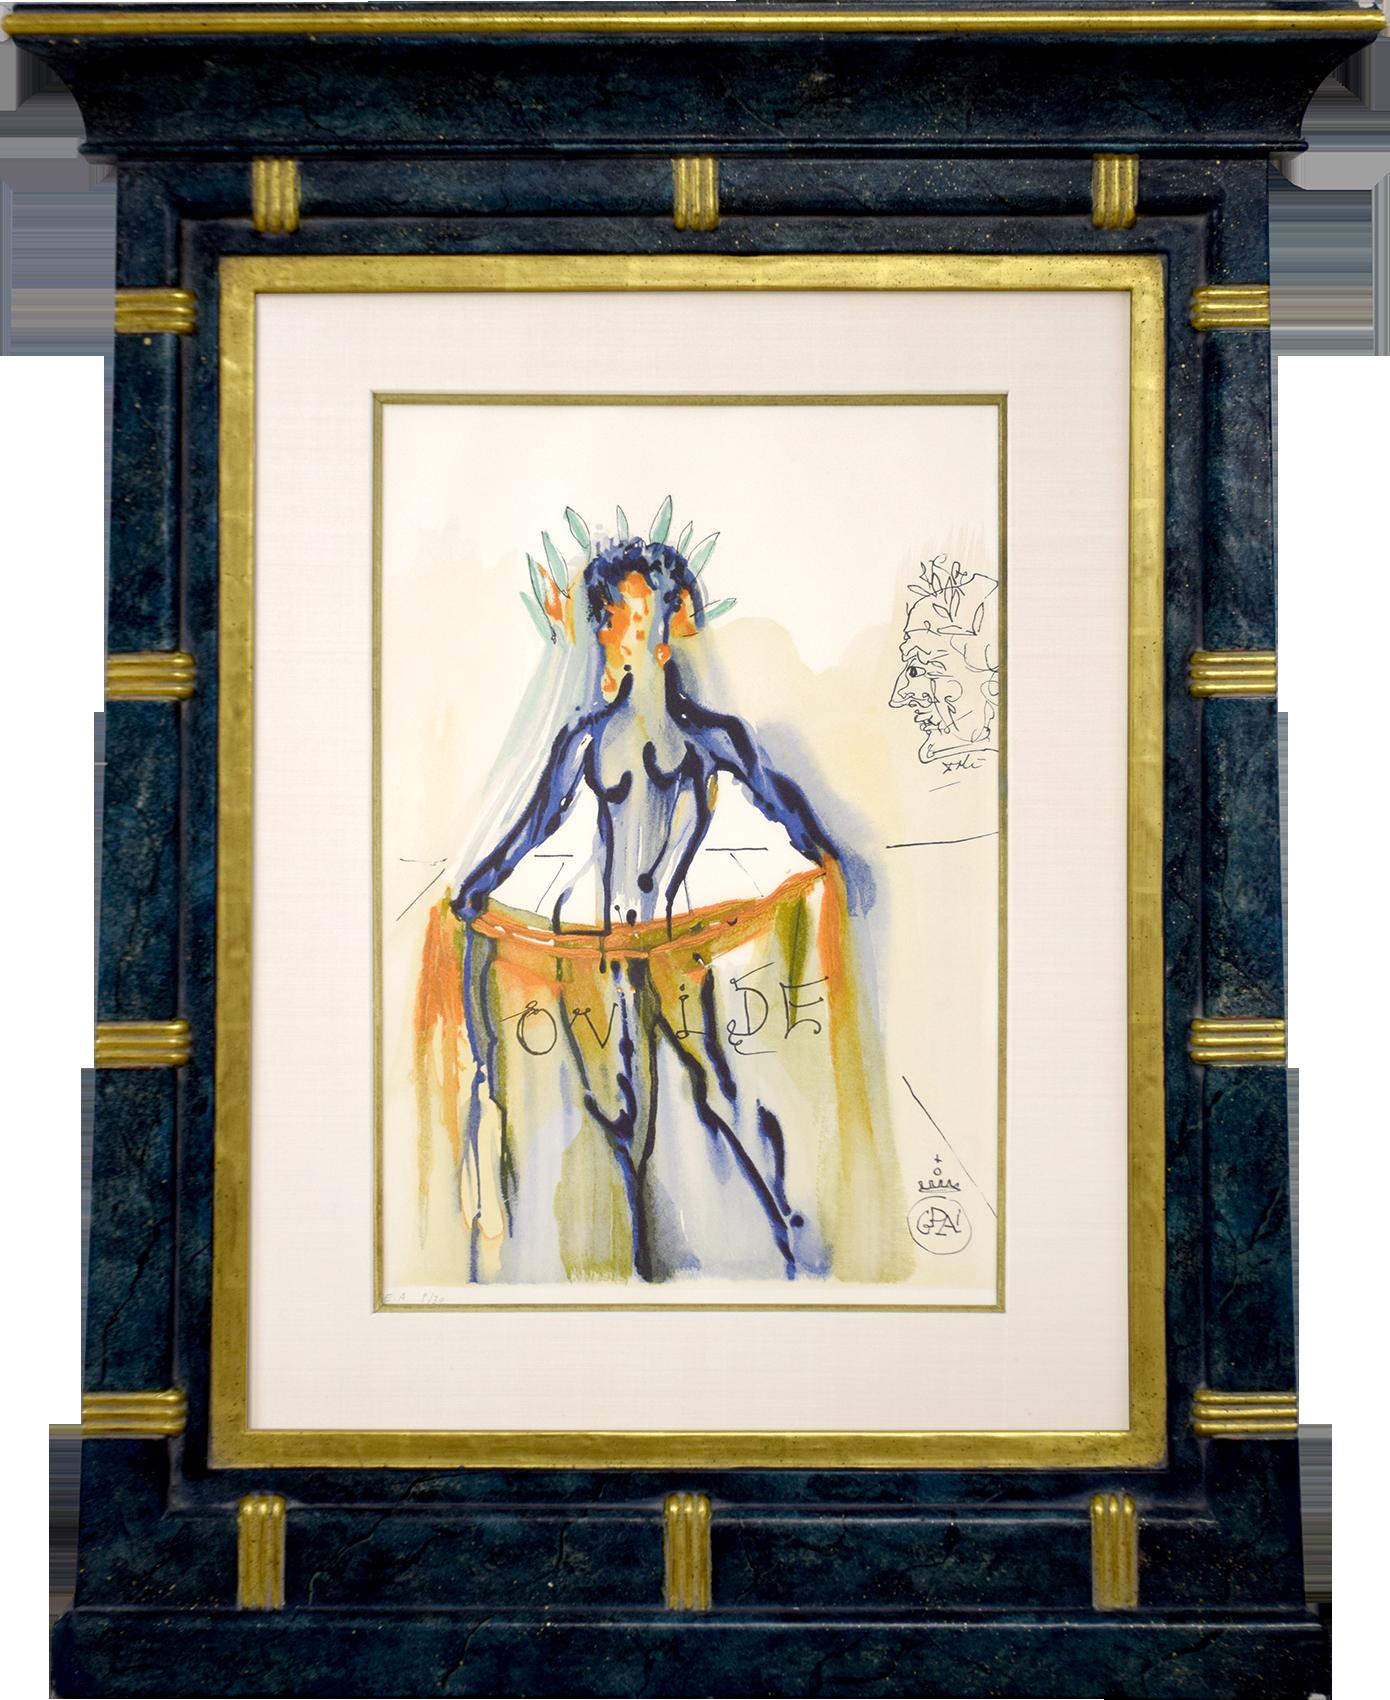 Salvador Dalí - Vénus , 0611-008-496